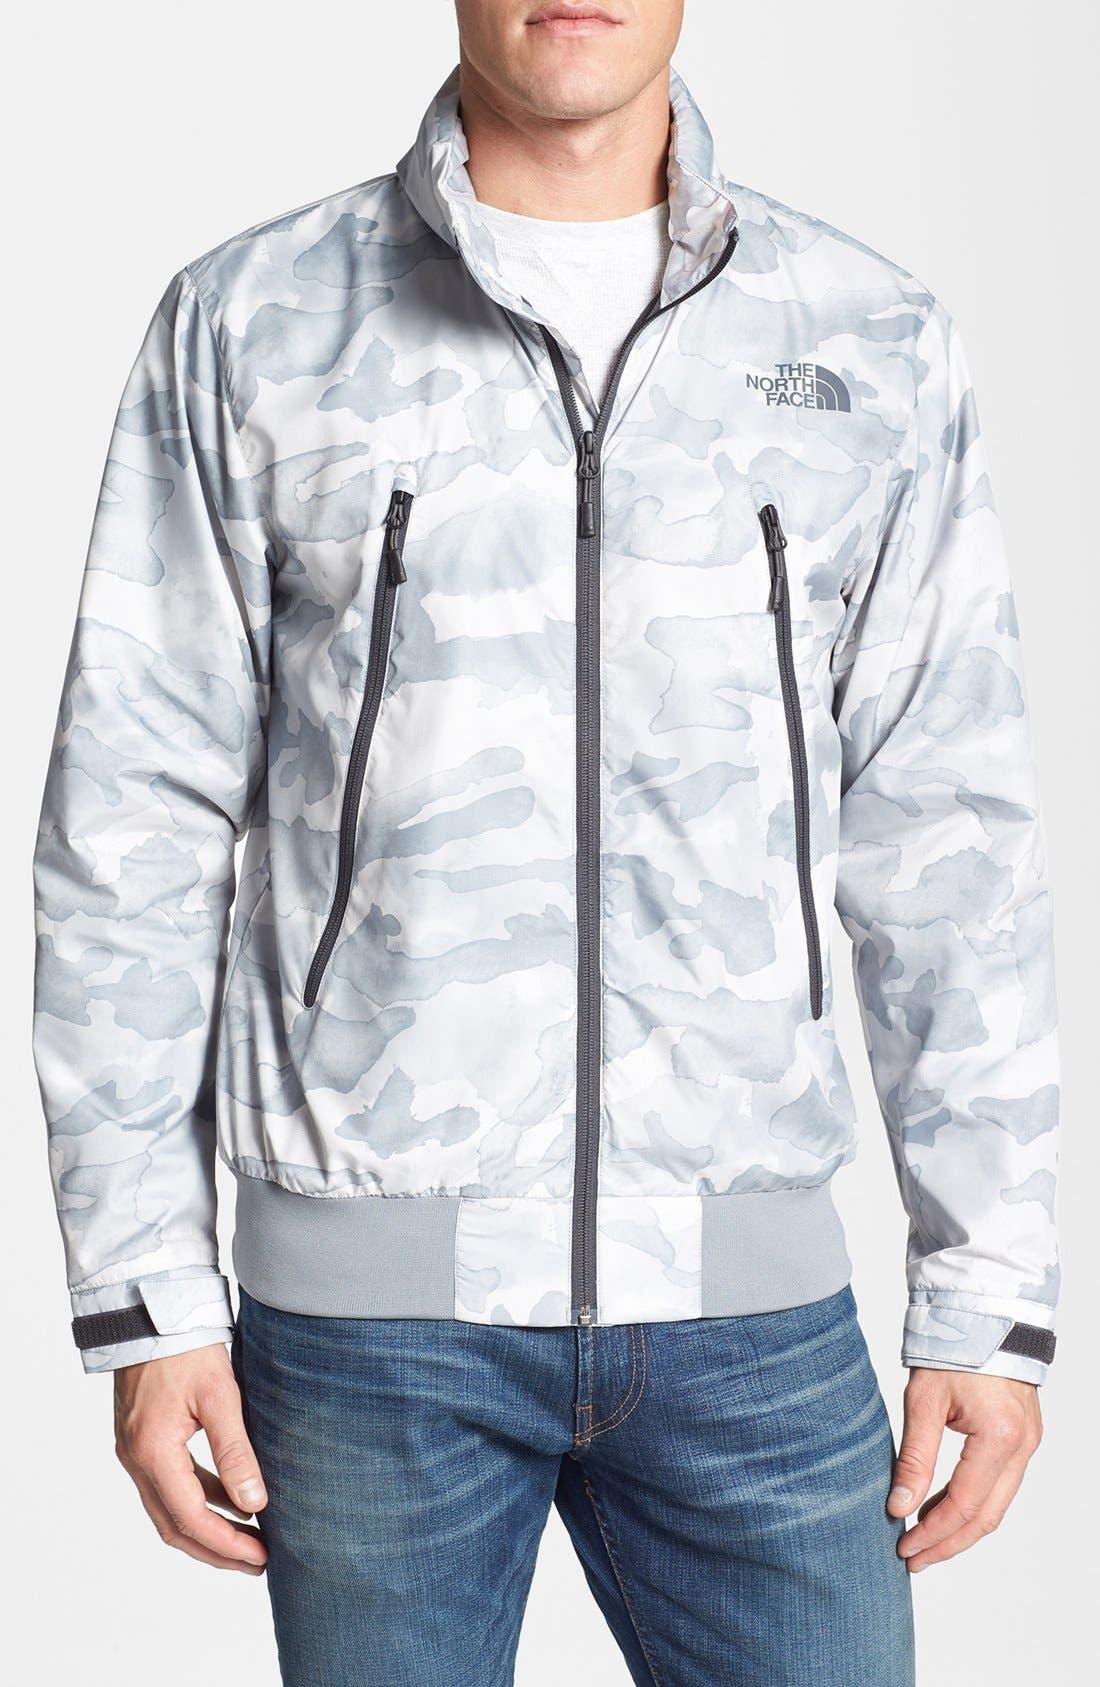 Main Image - The North Face 'Diablo' Windbreaker Jacket